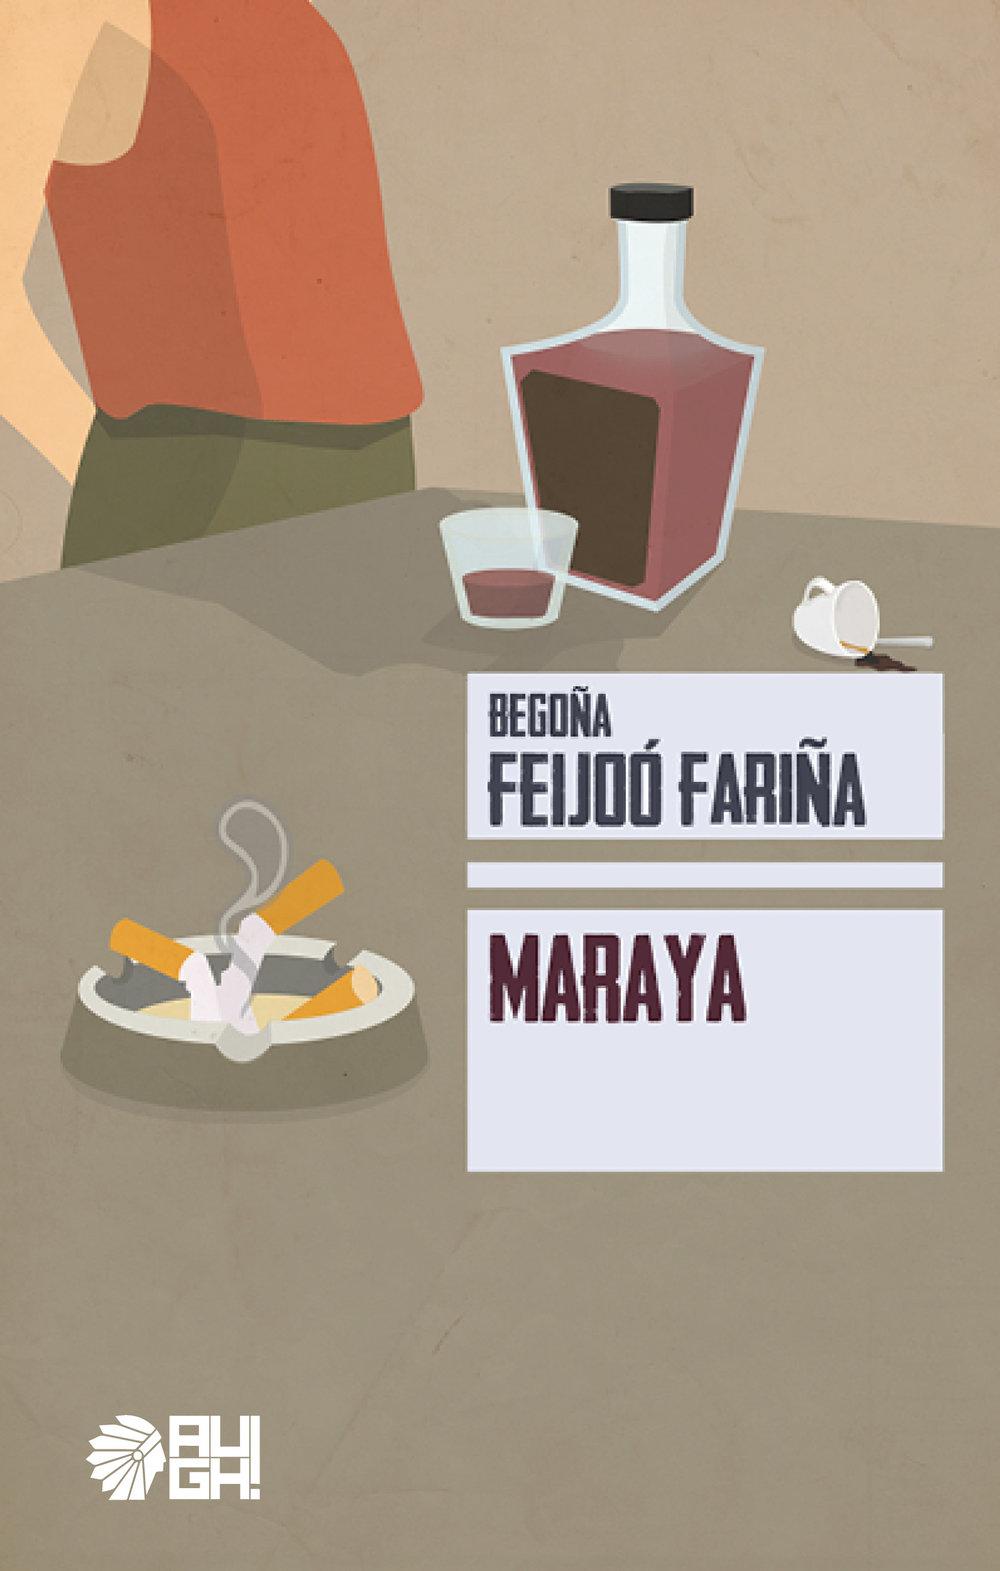 piatto_Maraya.jpg